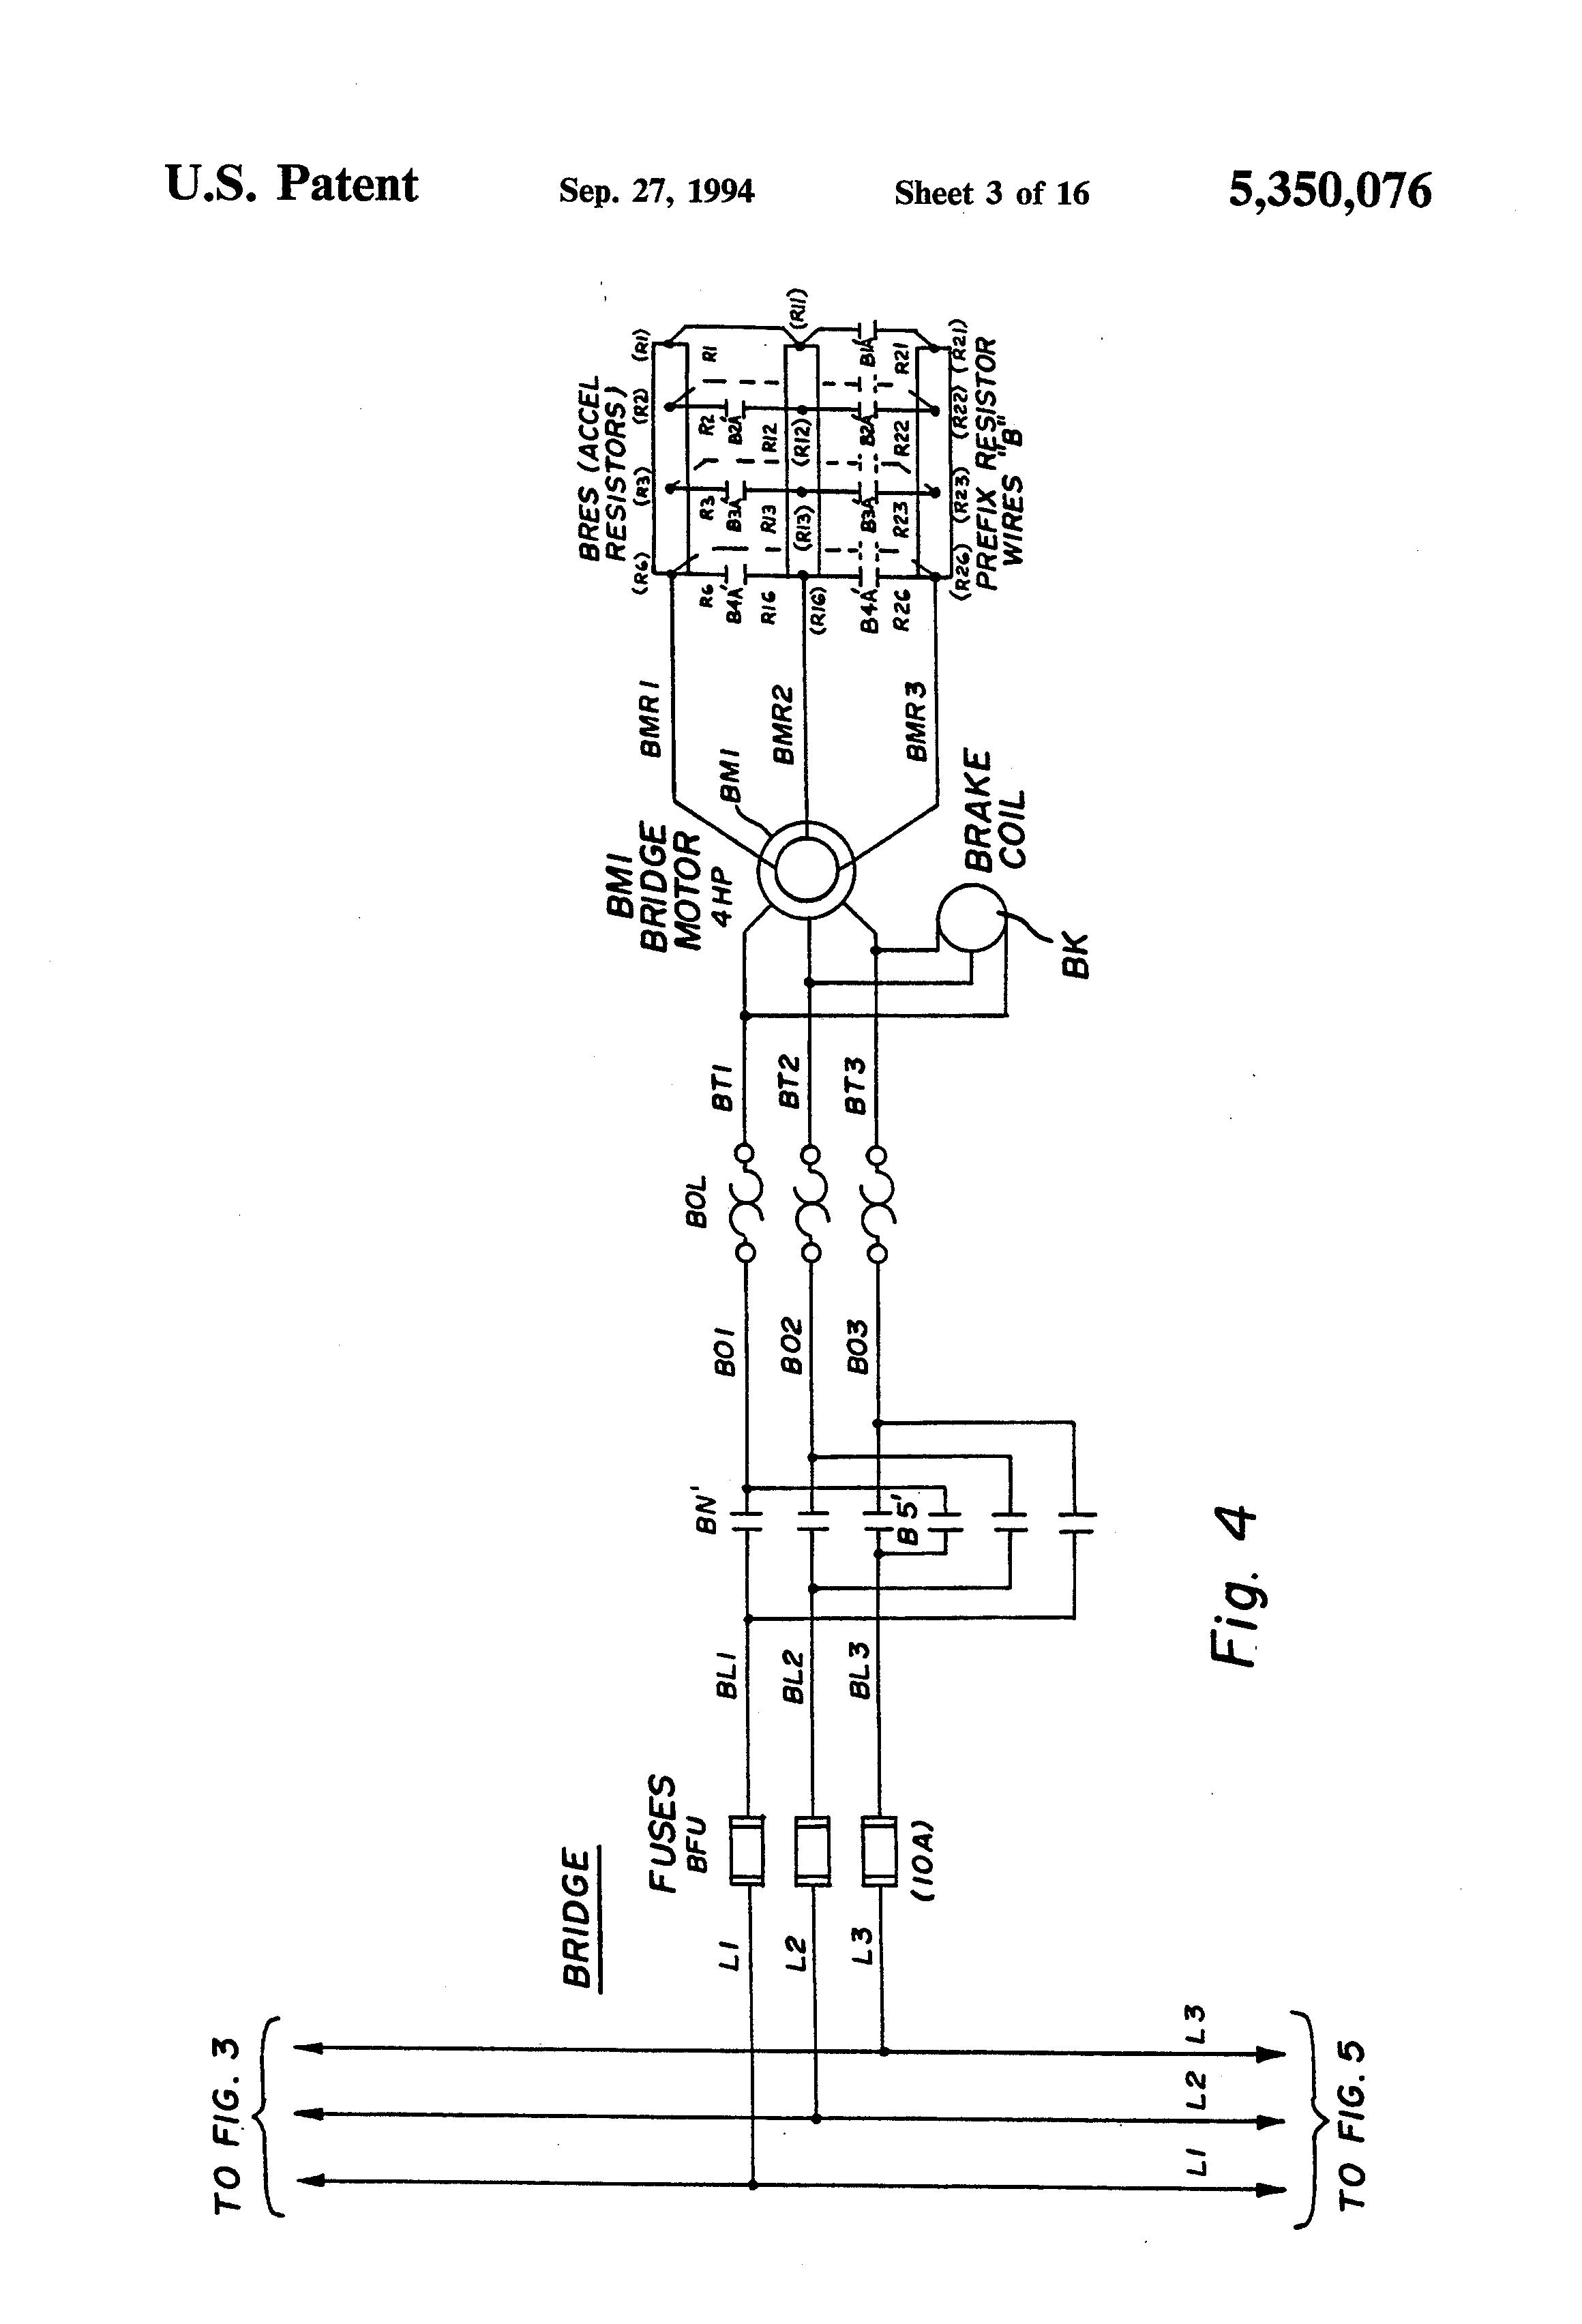 Electric Hoist 110v Pendant Diagram | Wiring Diagram Database on